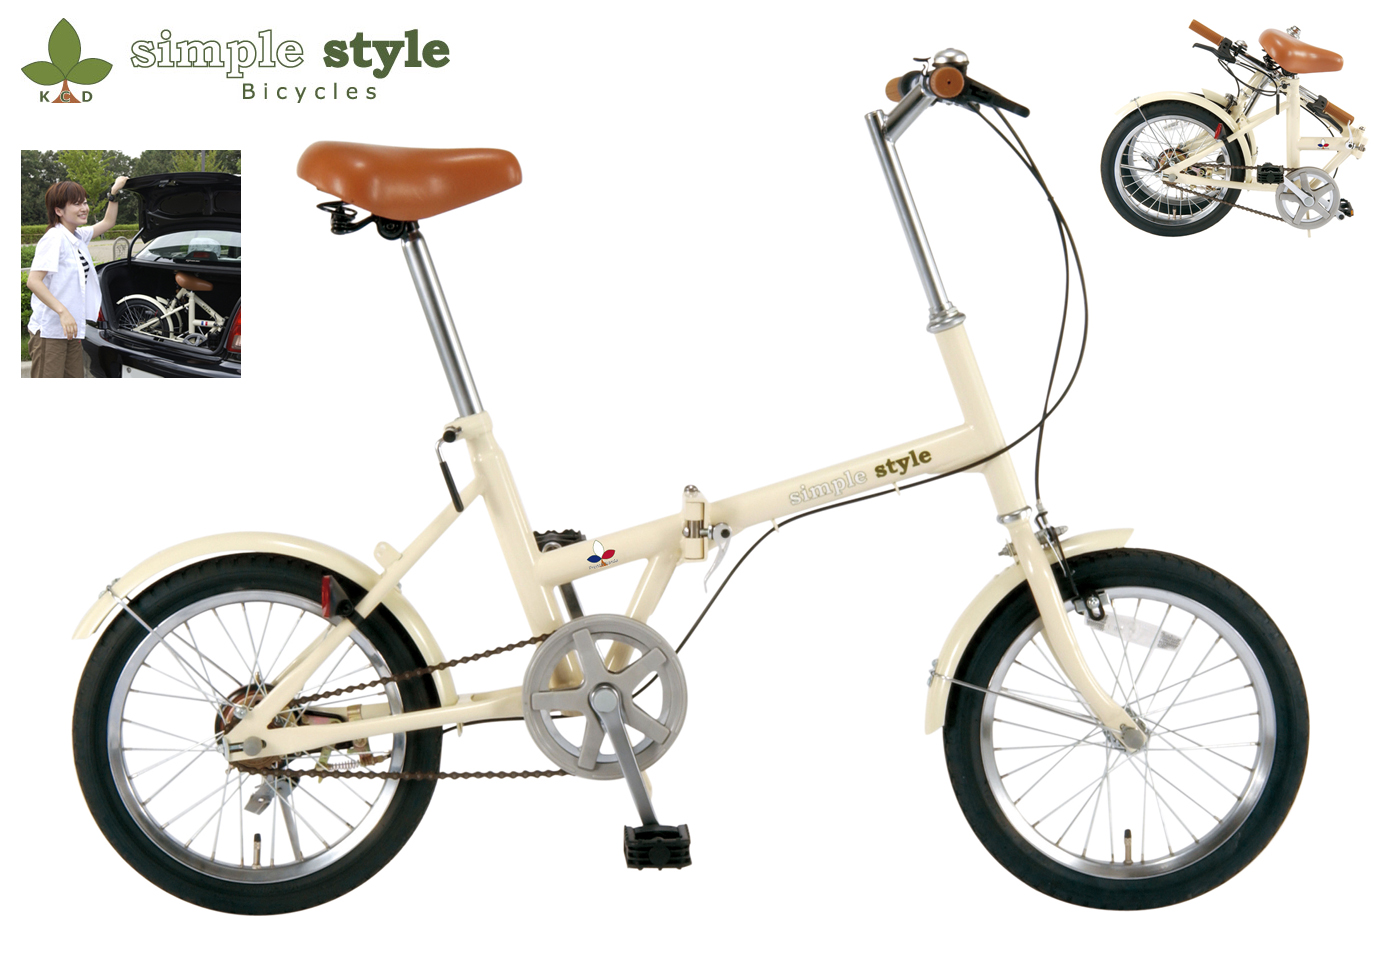 【KCD】16型折りたたみ自転車 シンプルスタイル 使用時/約135×53×高さ92cm アイボリー